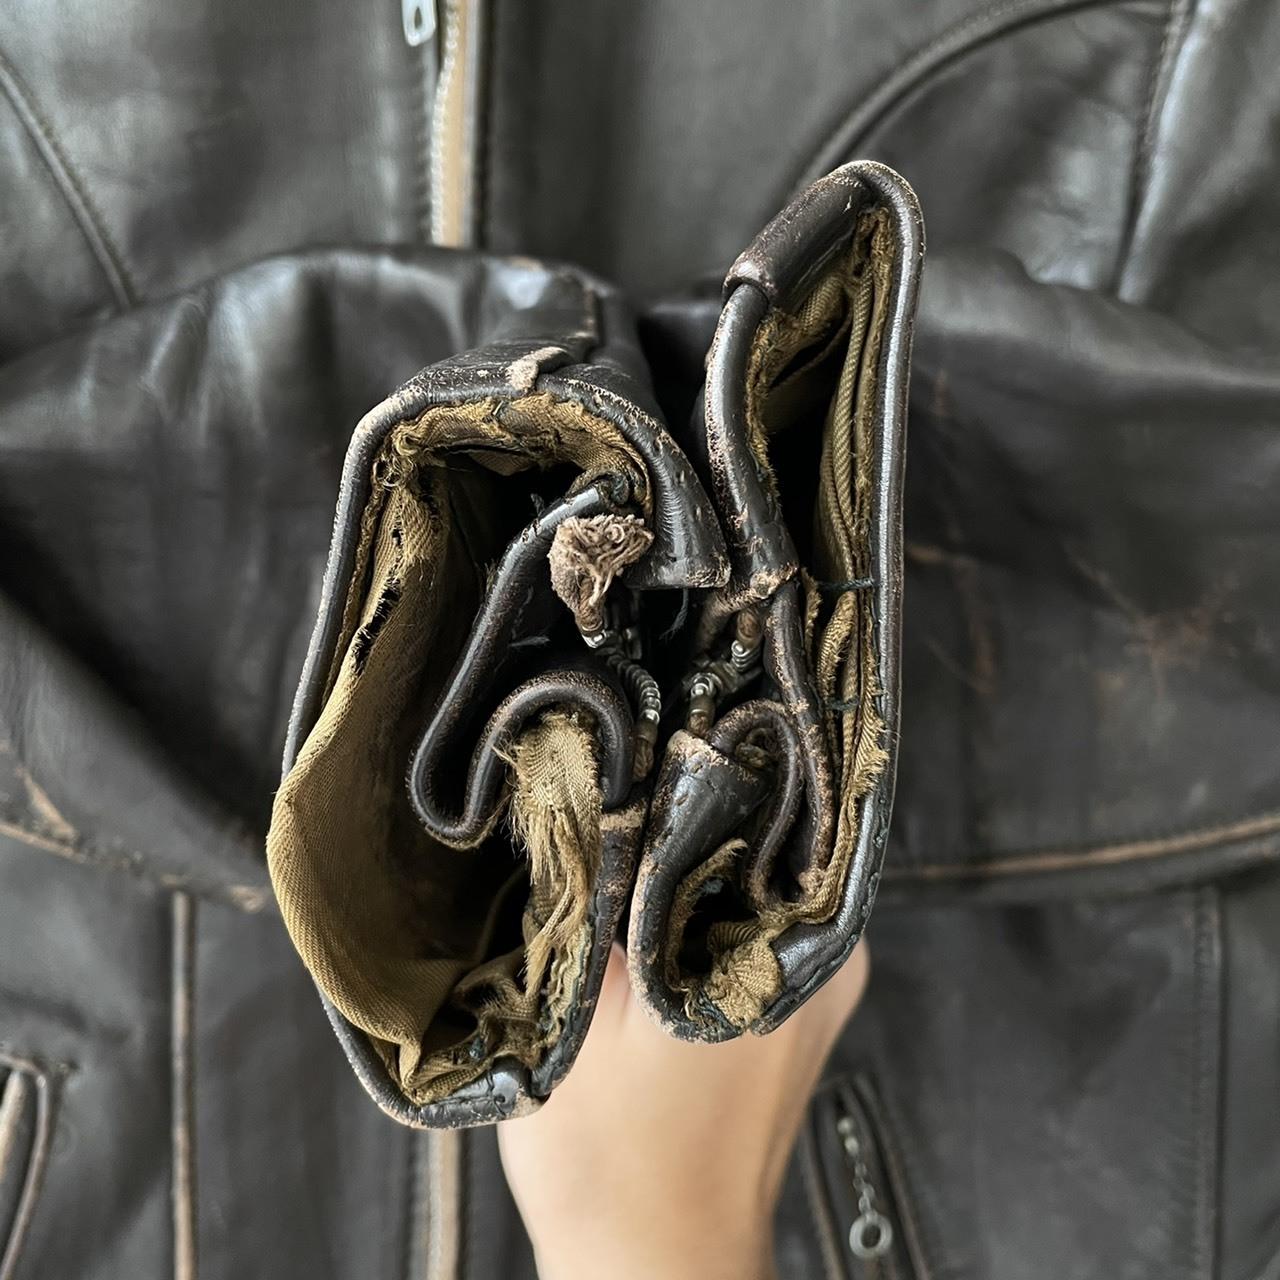 Leather Jacket_c0146178_12330477.jpg